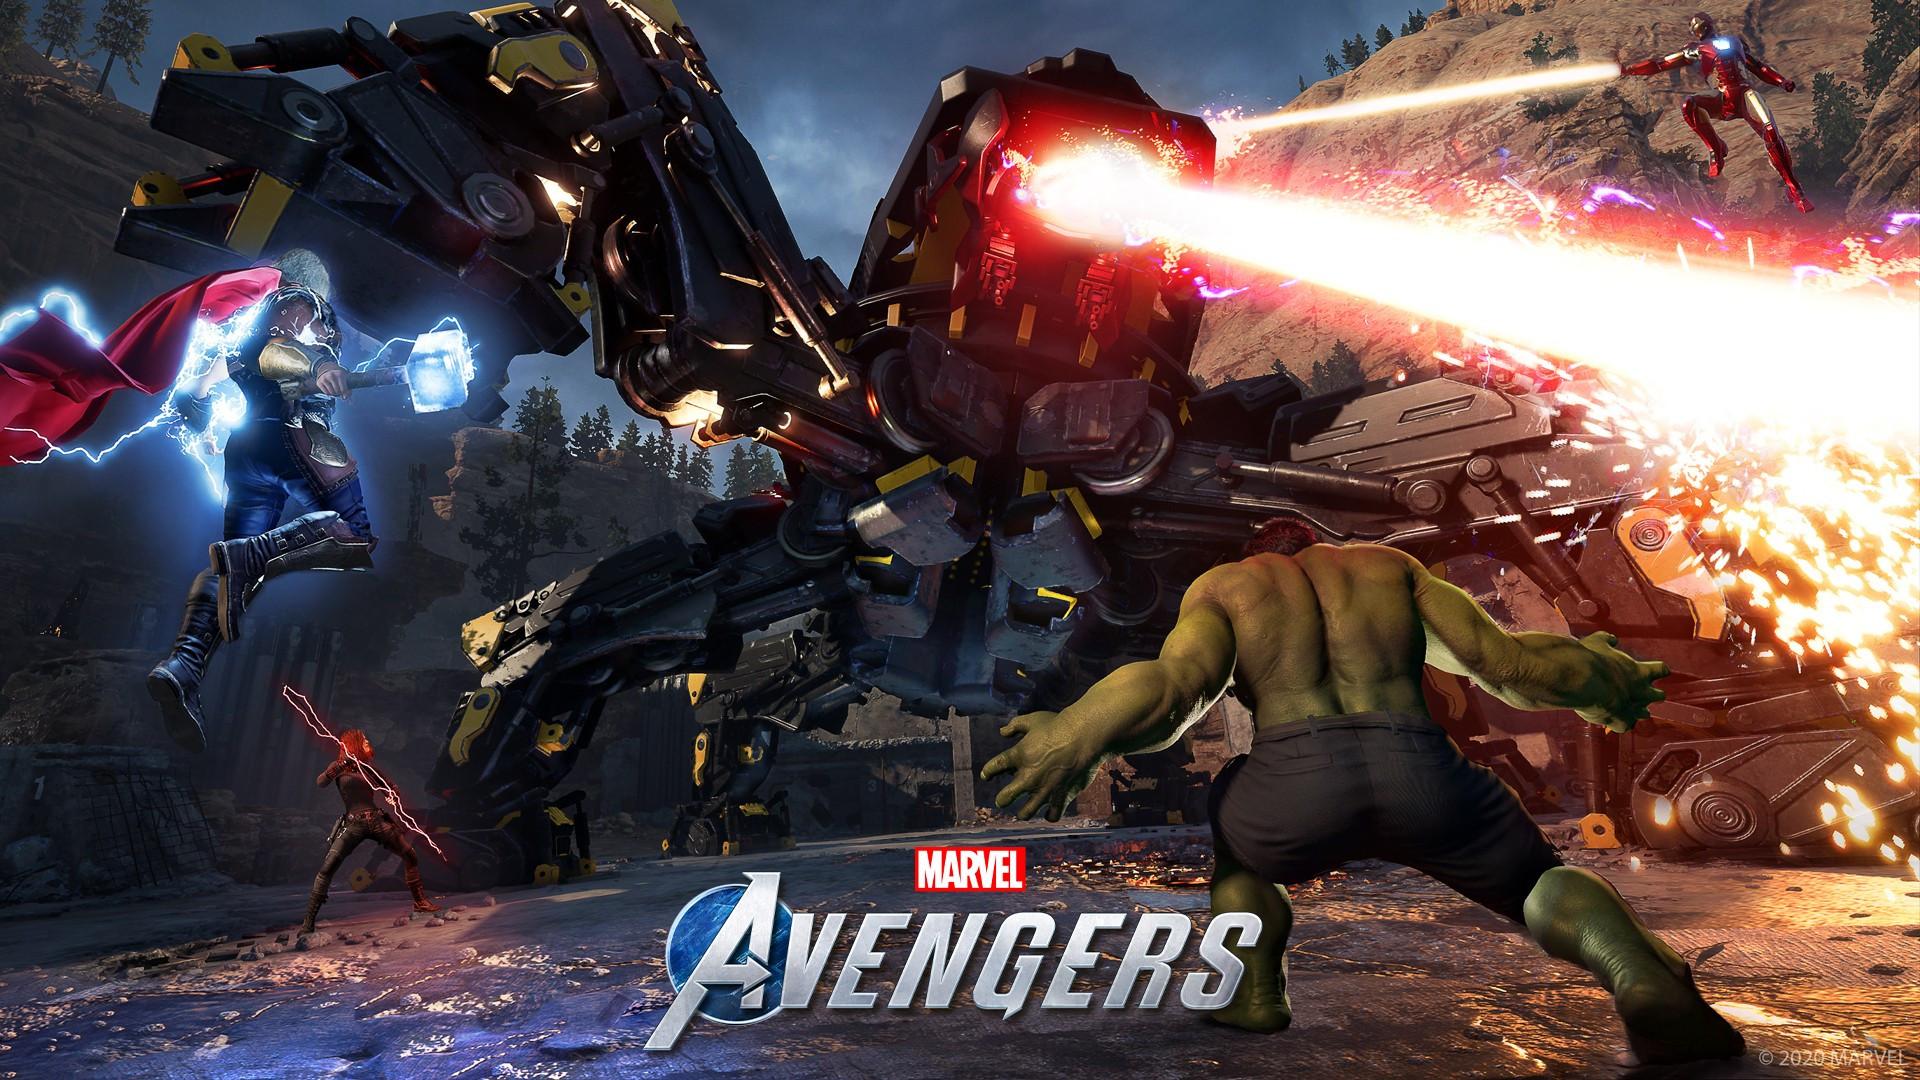 Marvel's Avengers выйдет на Xbox Series X и получит поддержку Smart Delivery